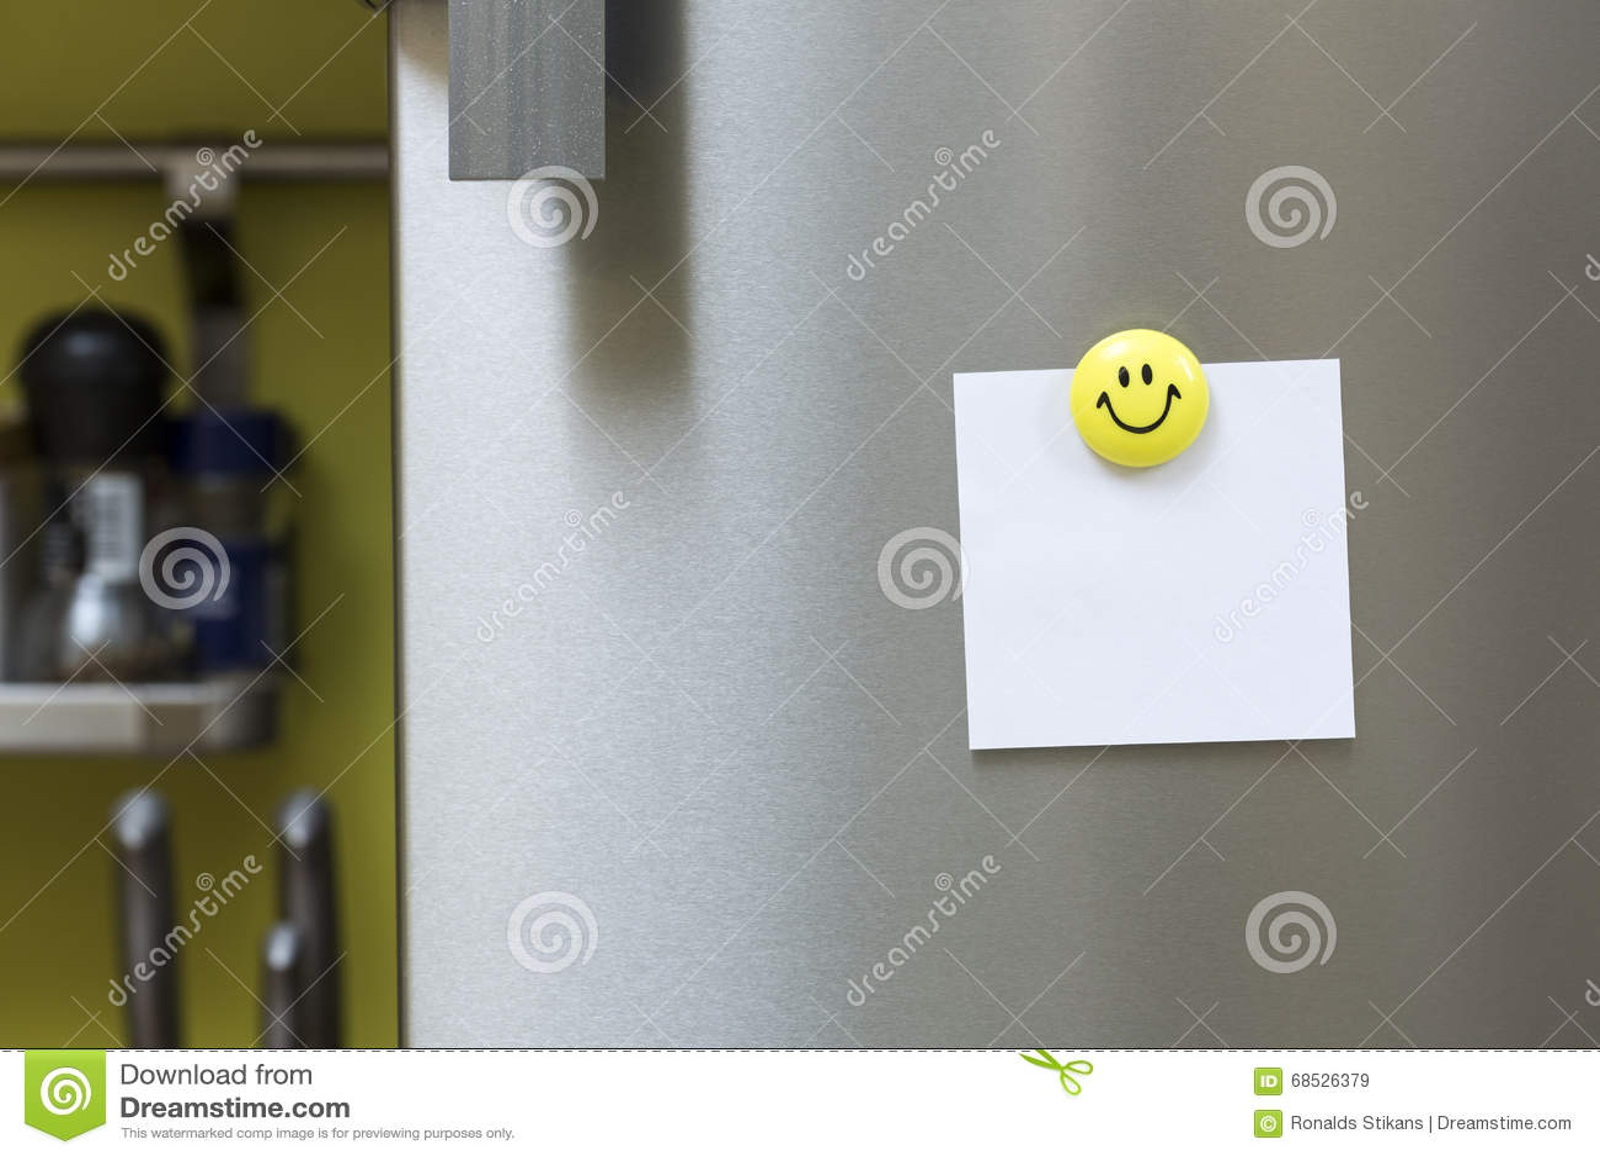 Blank Paper Note With Magnet Hanging On Fridge Door Stock Image ...